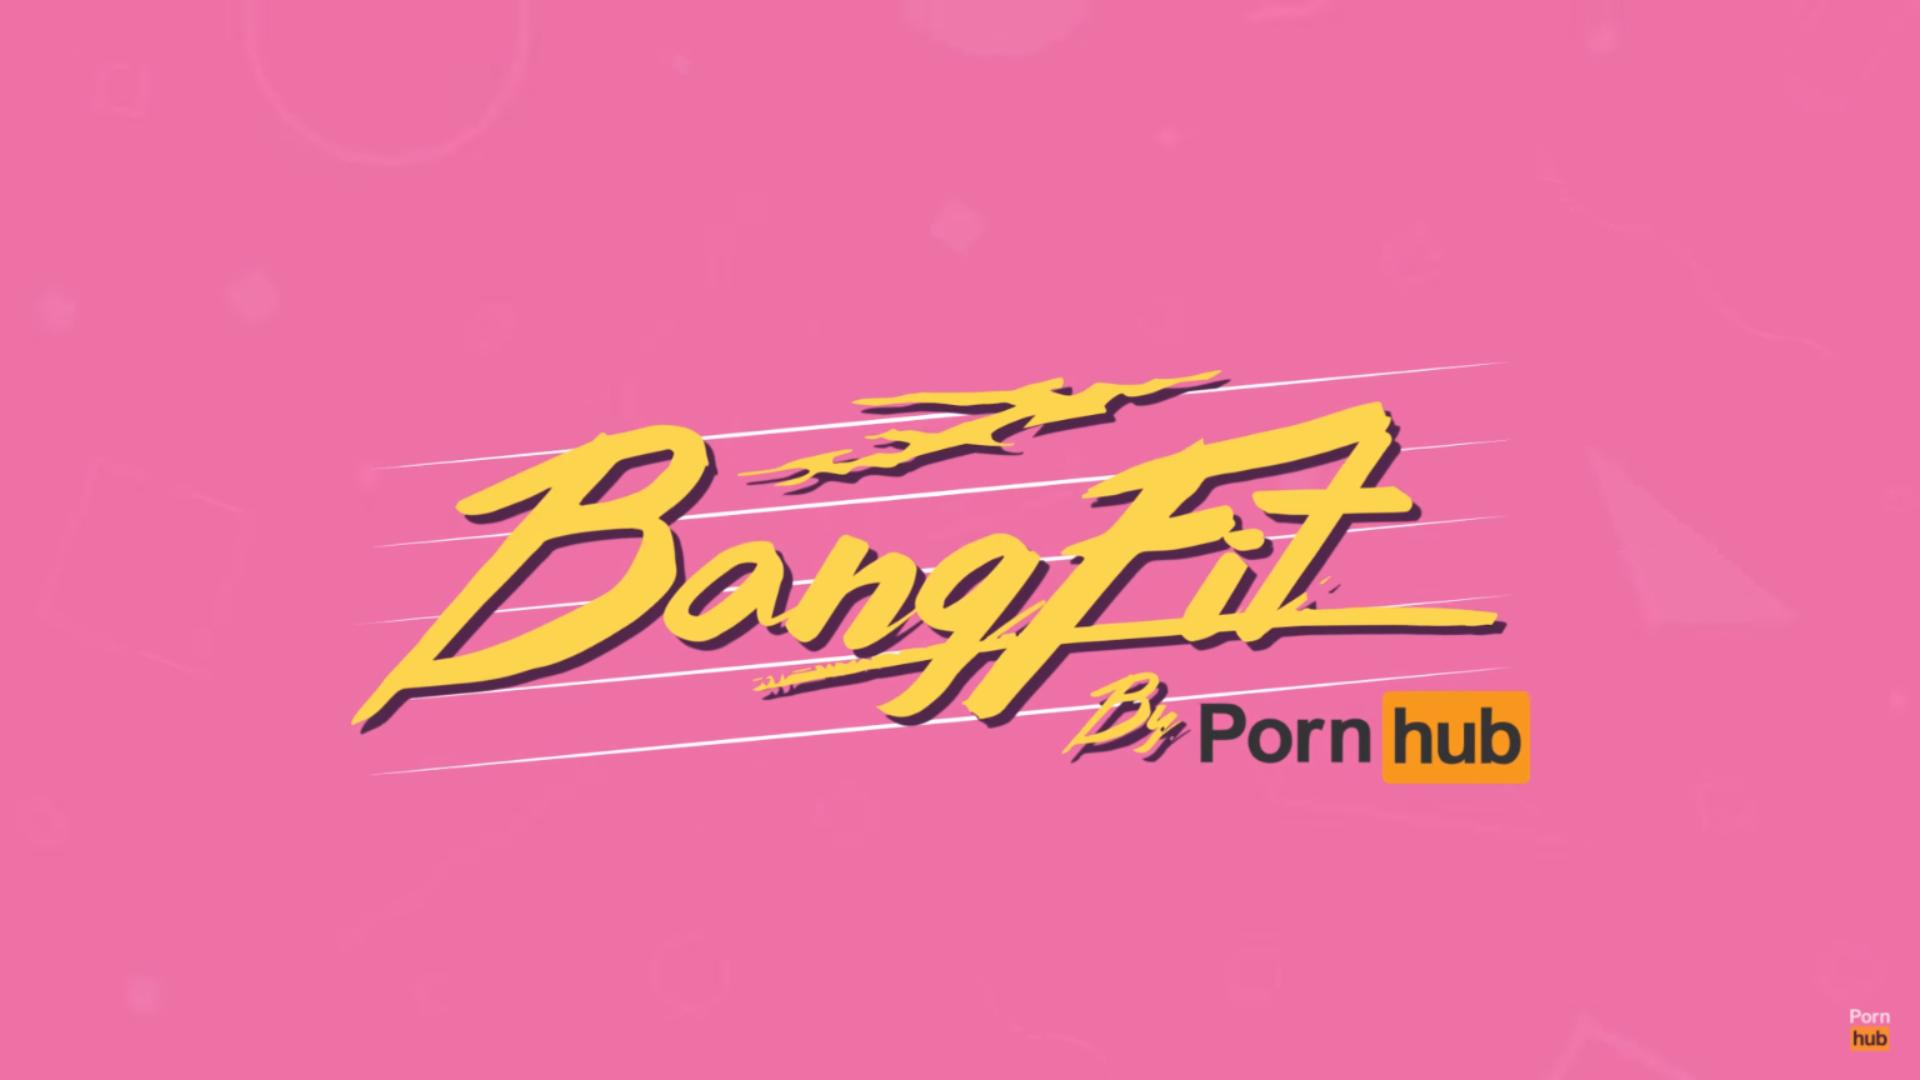 Pornhub launches BangFit, a new game-based exercise program - http://elitegamer.ie/pornhub-launches-bangfit-new-game-based-exercise-program/